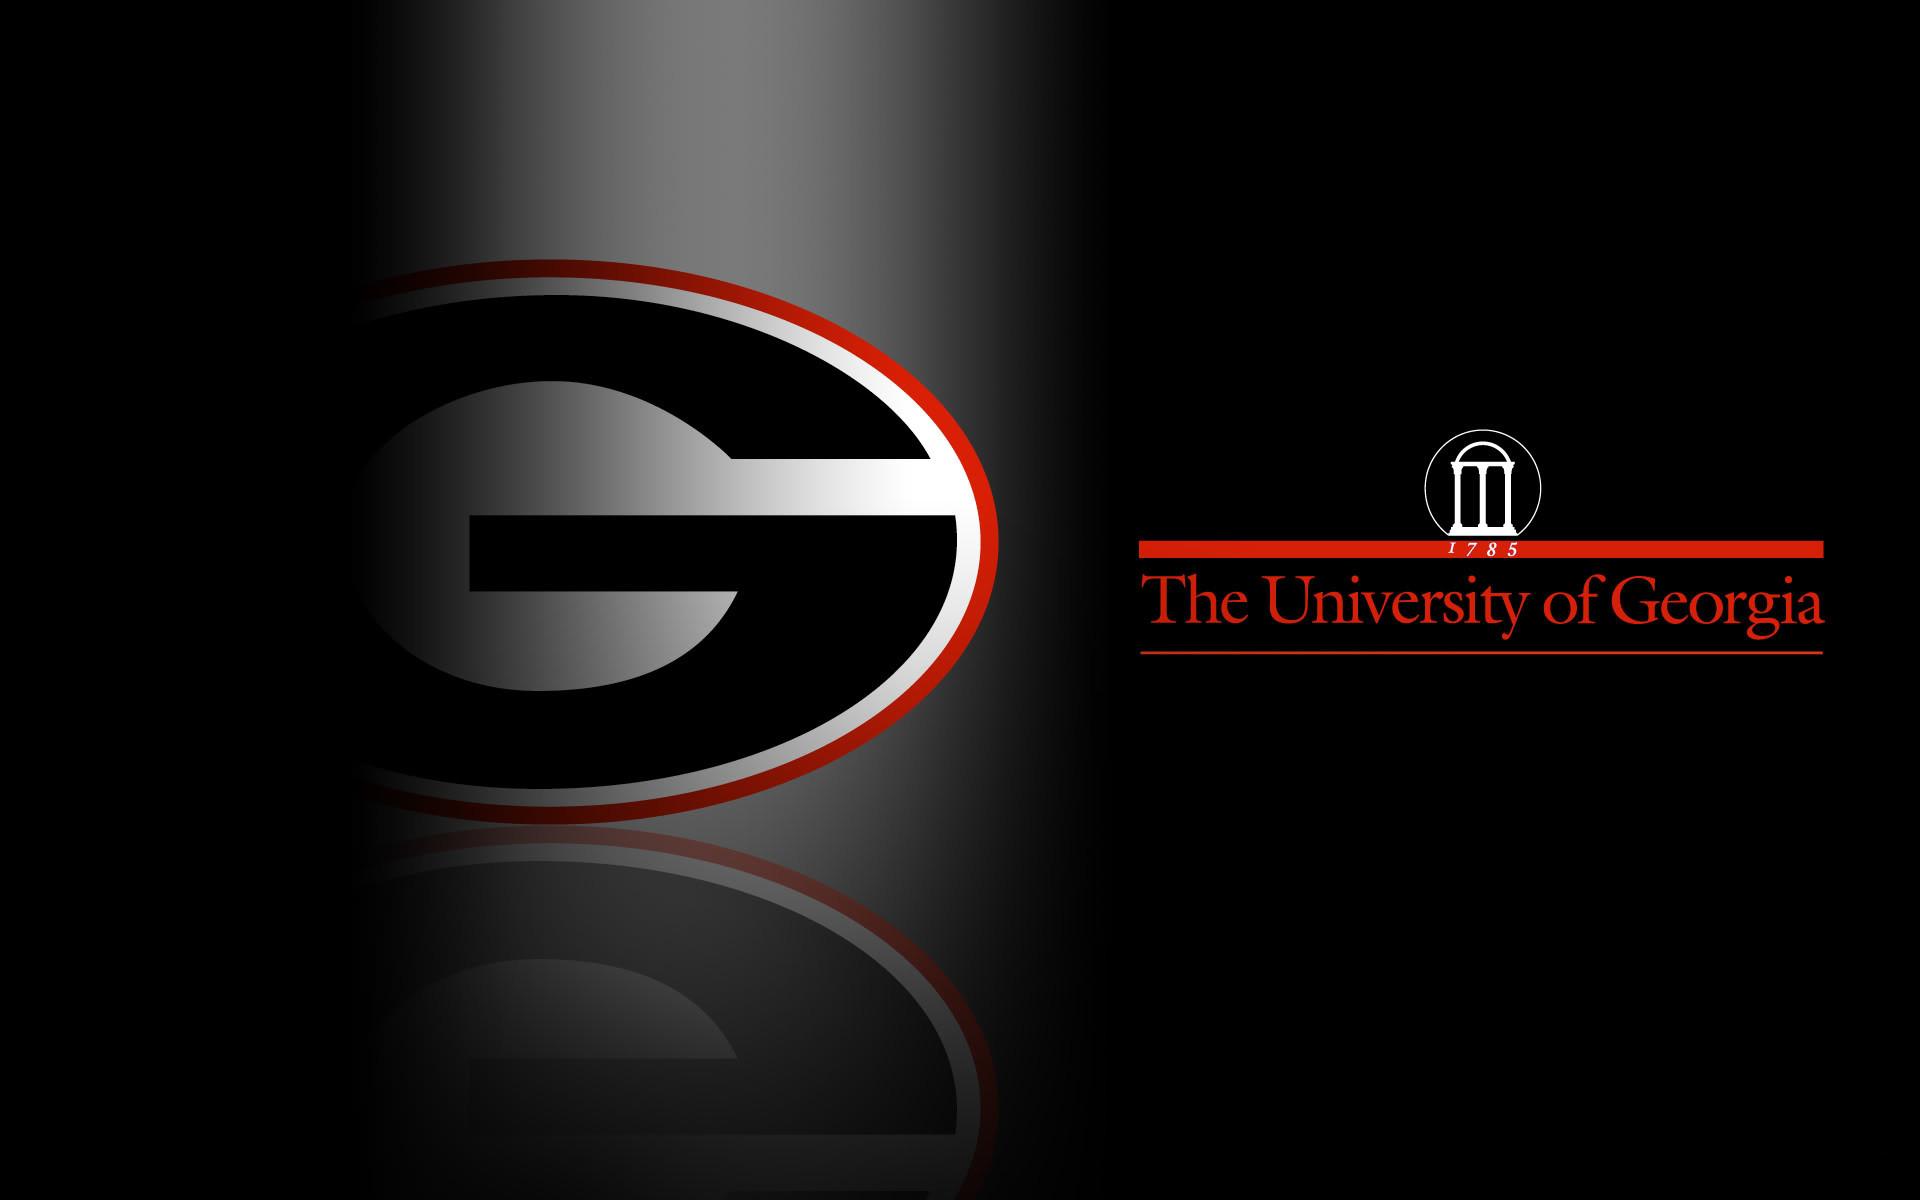 University of Georgia Wallpaper